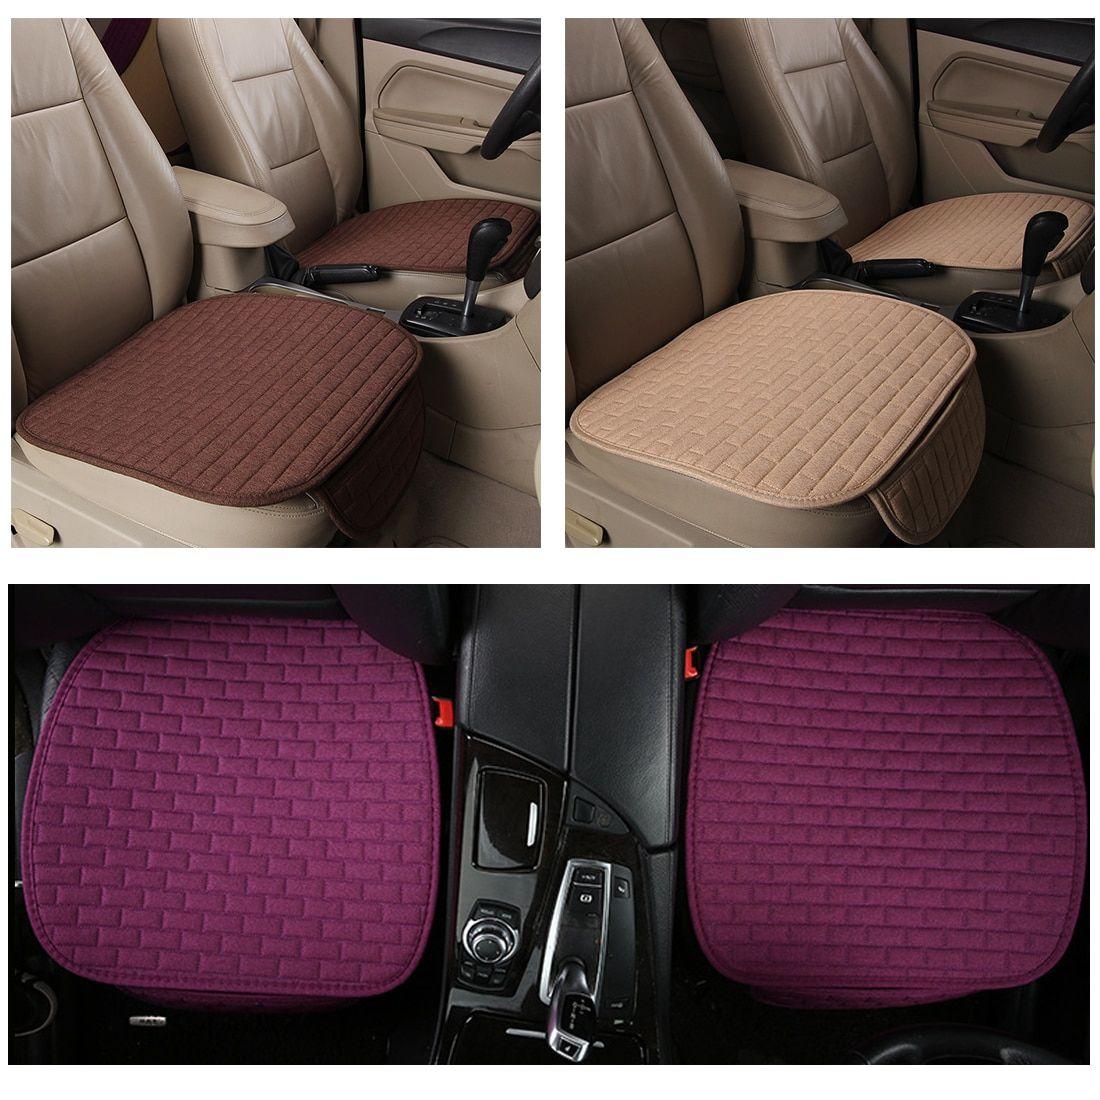 Dewtreetali Universal Seat Covers Car Seat Protector Flax Single Non Slip Cushion Warm Car Seat Cover For Auto Car Seats Car Seat Protector Diy Car Seat Cover